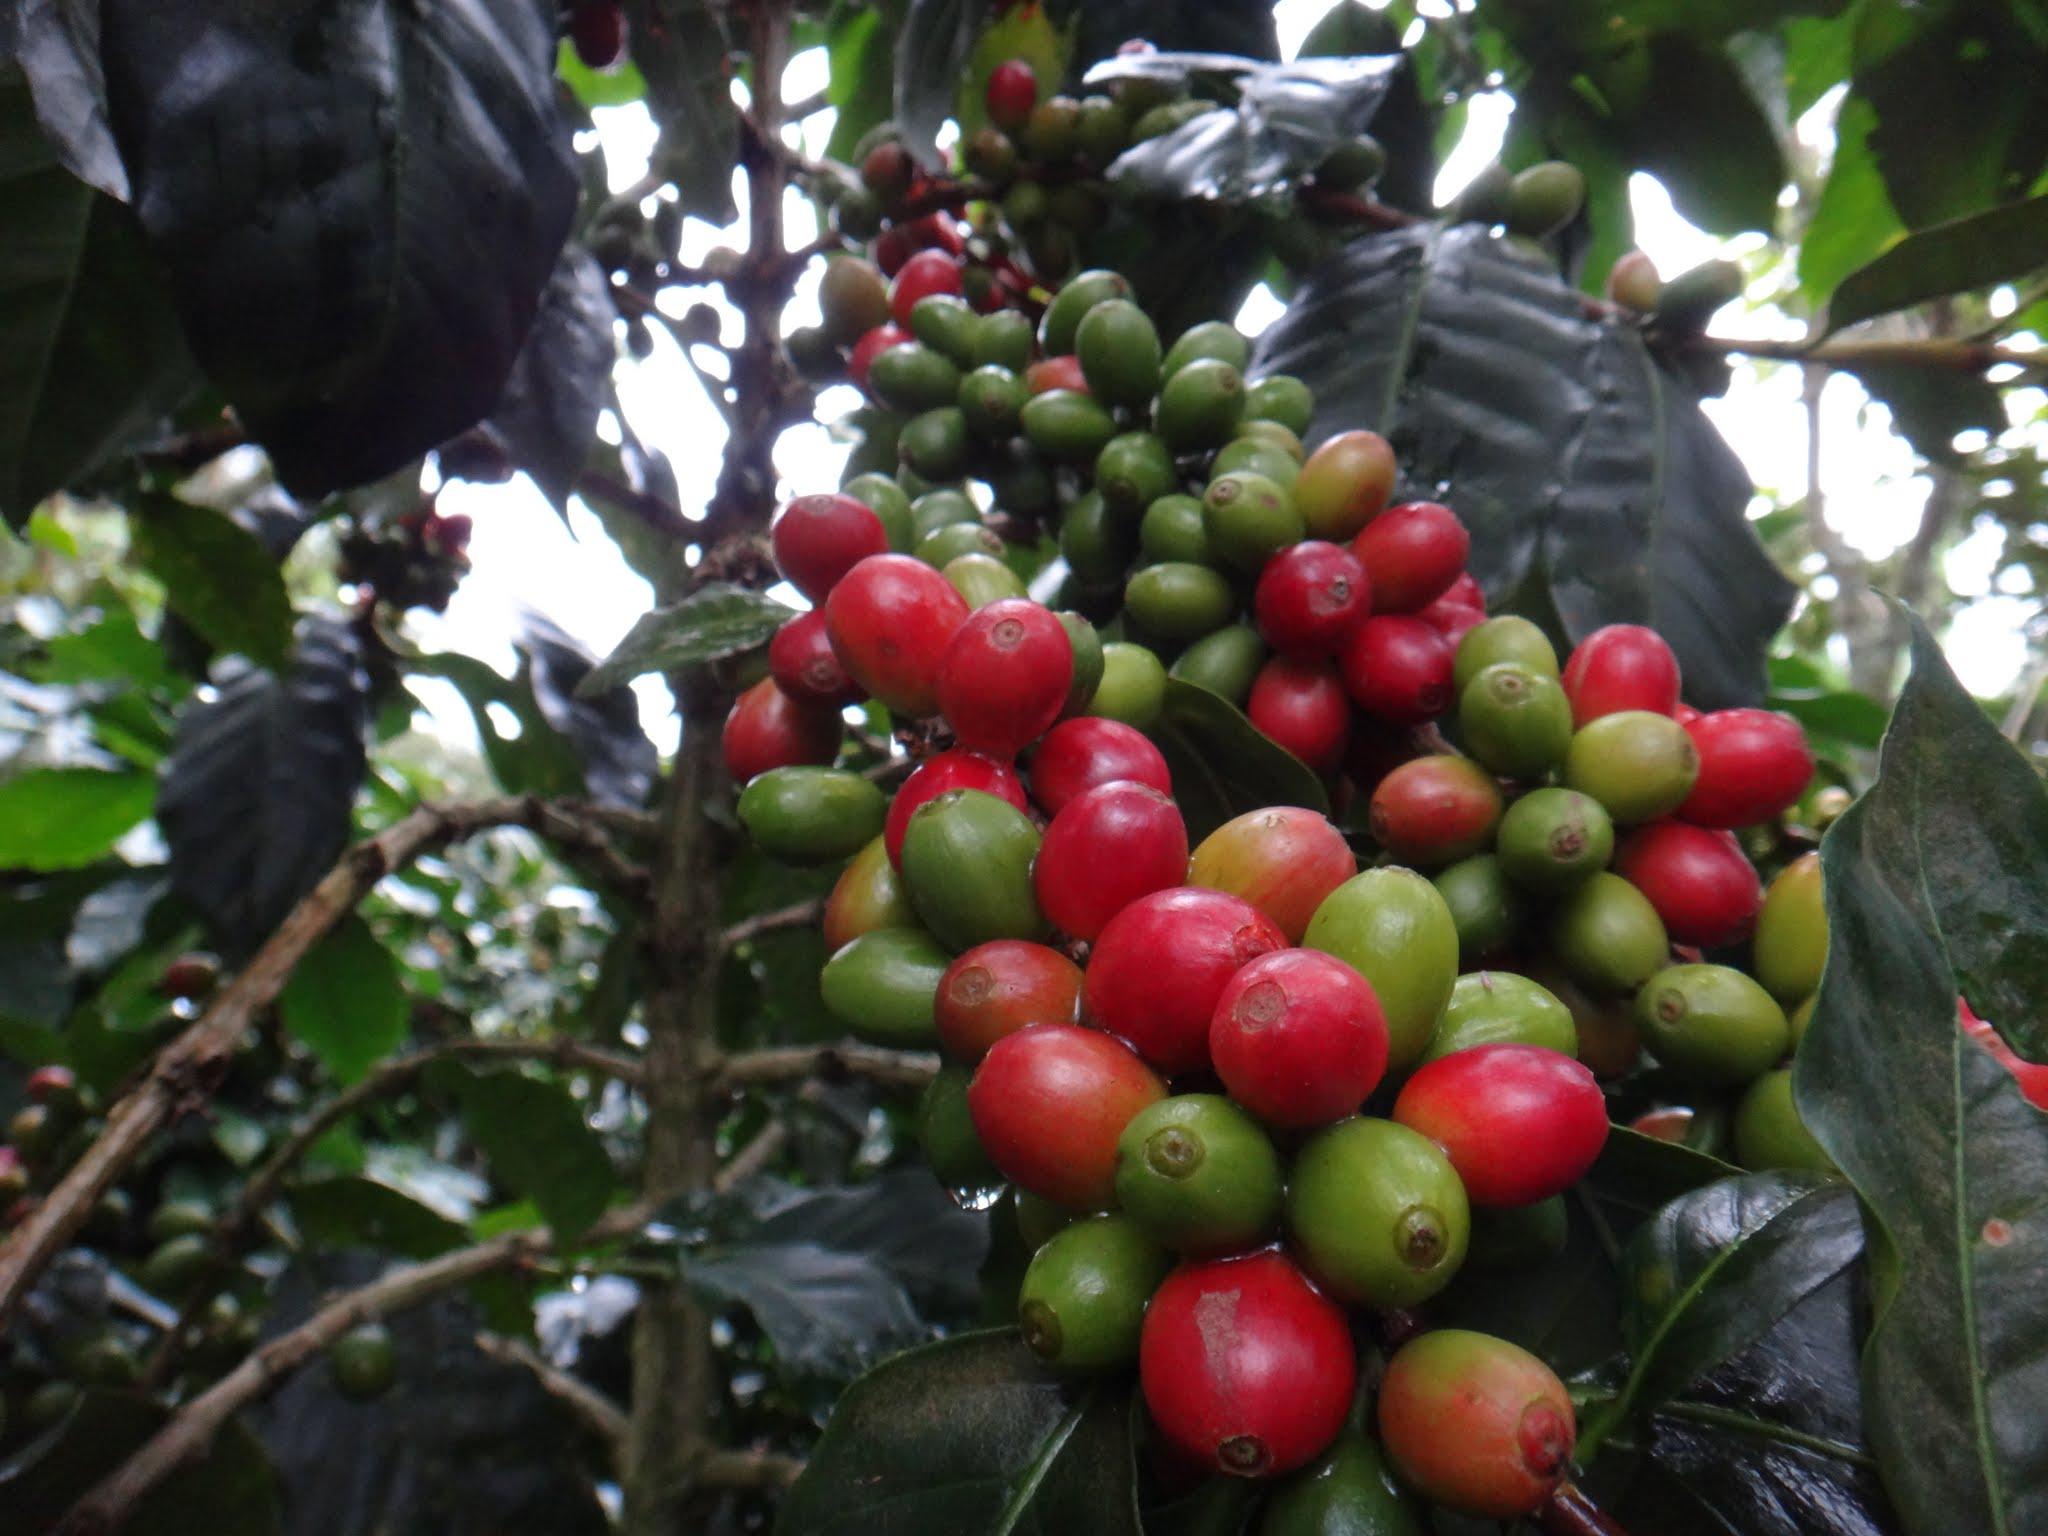 flor-del-pino-honduras-fairtrade-coffee-31